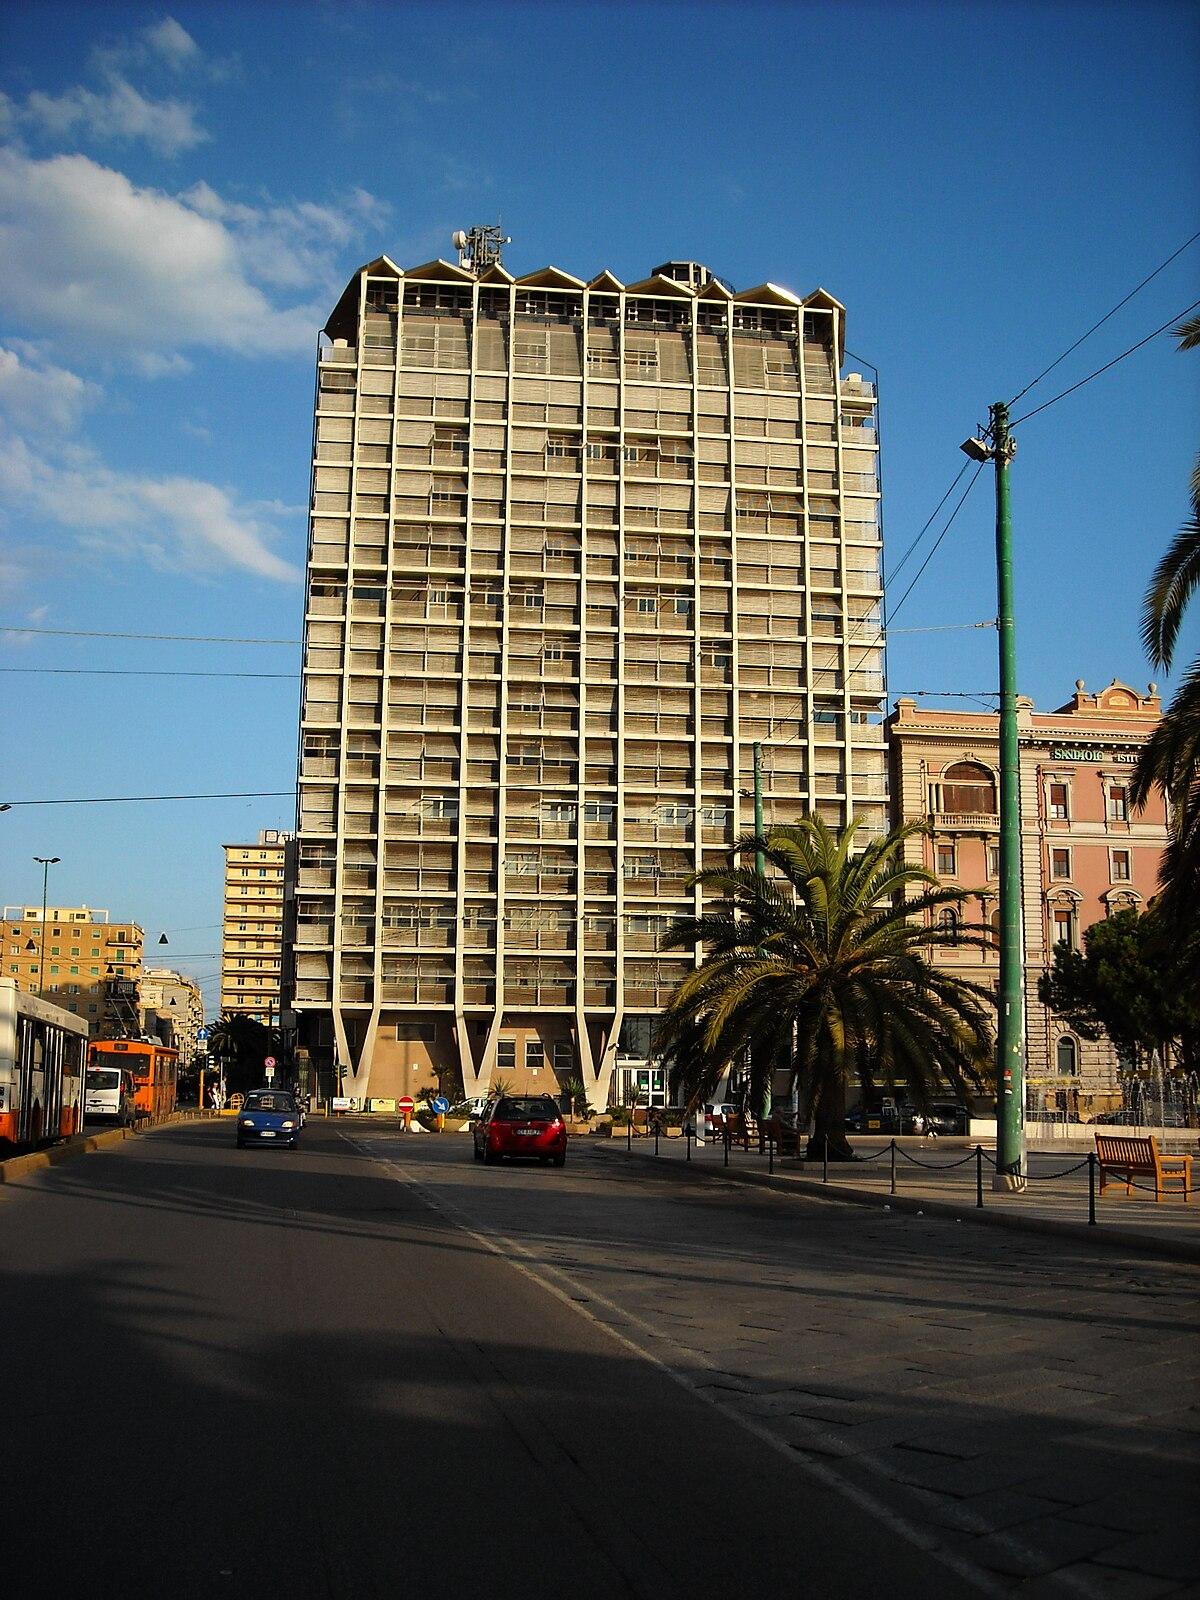 Palazzo ENEL - Wikipedia